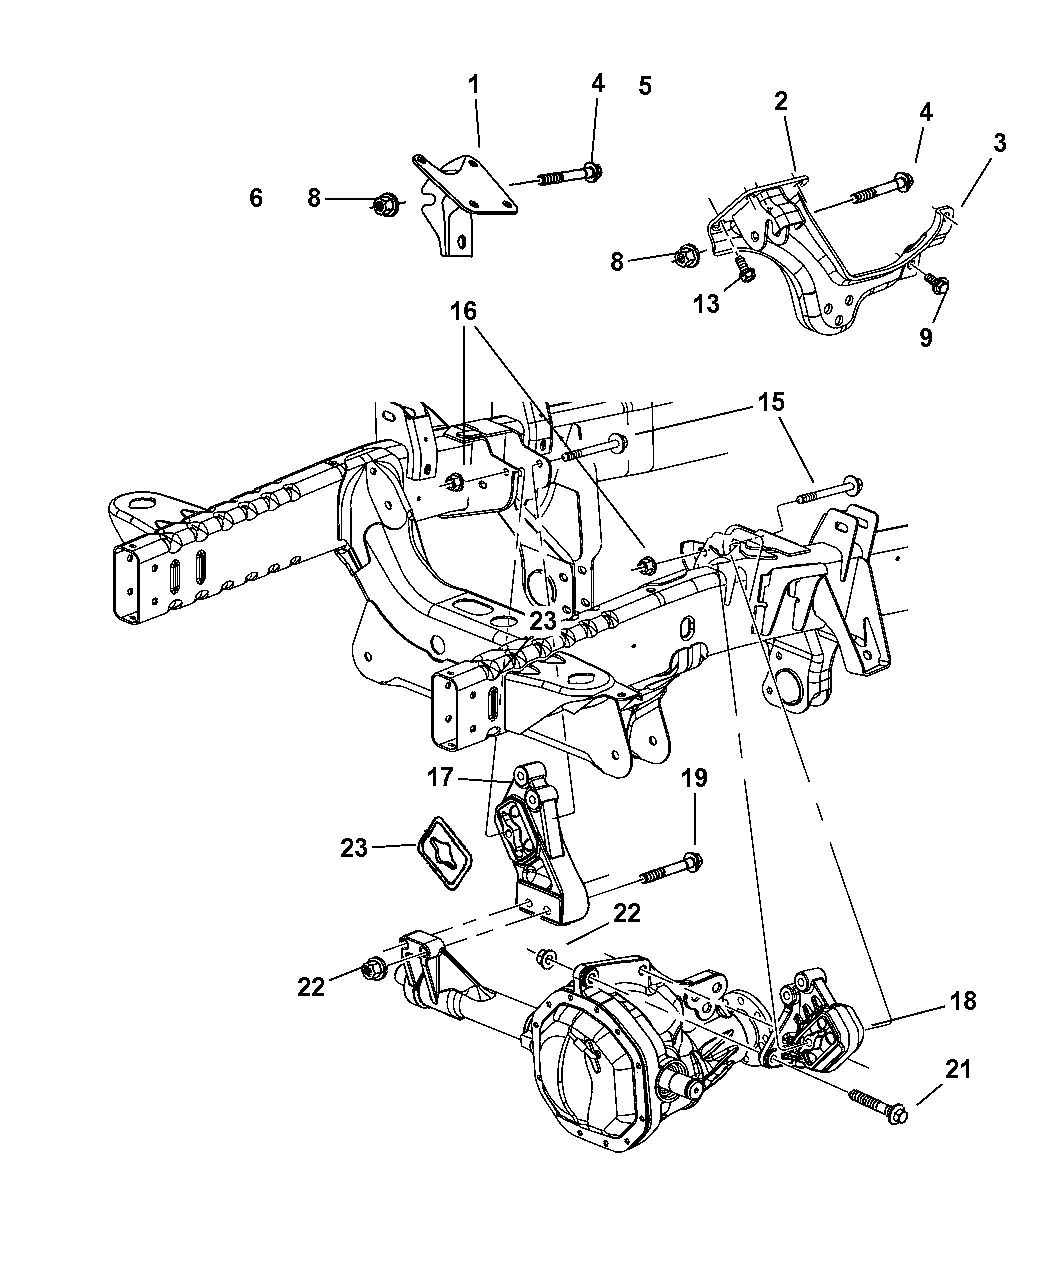 2003 ram 1500 engine